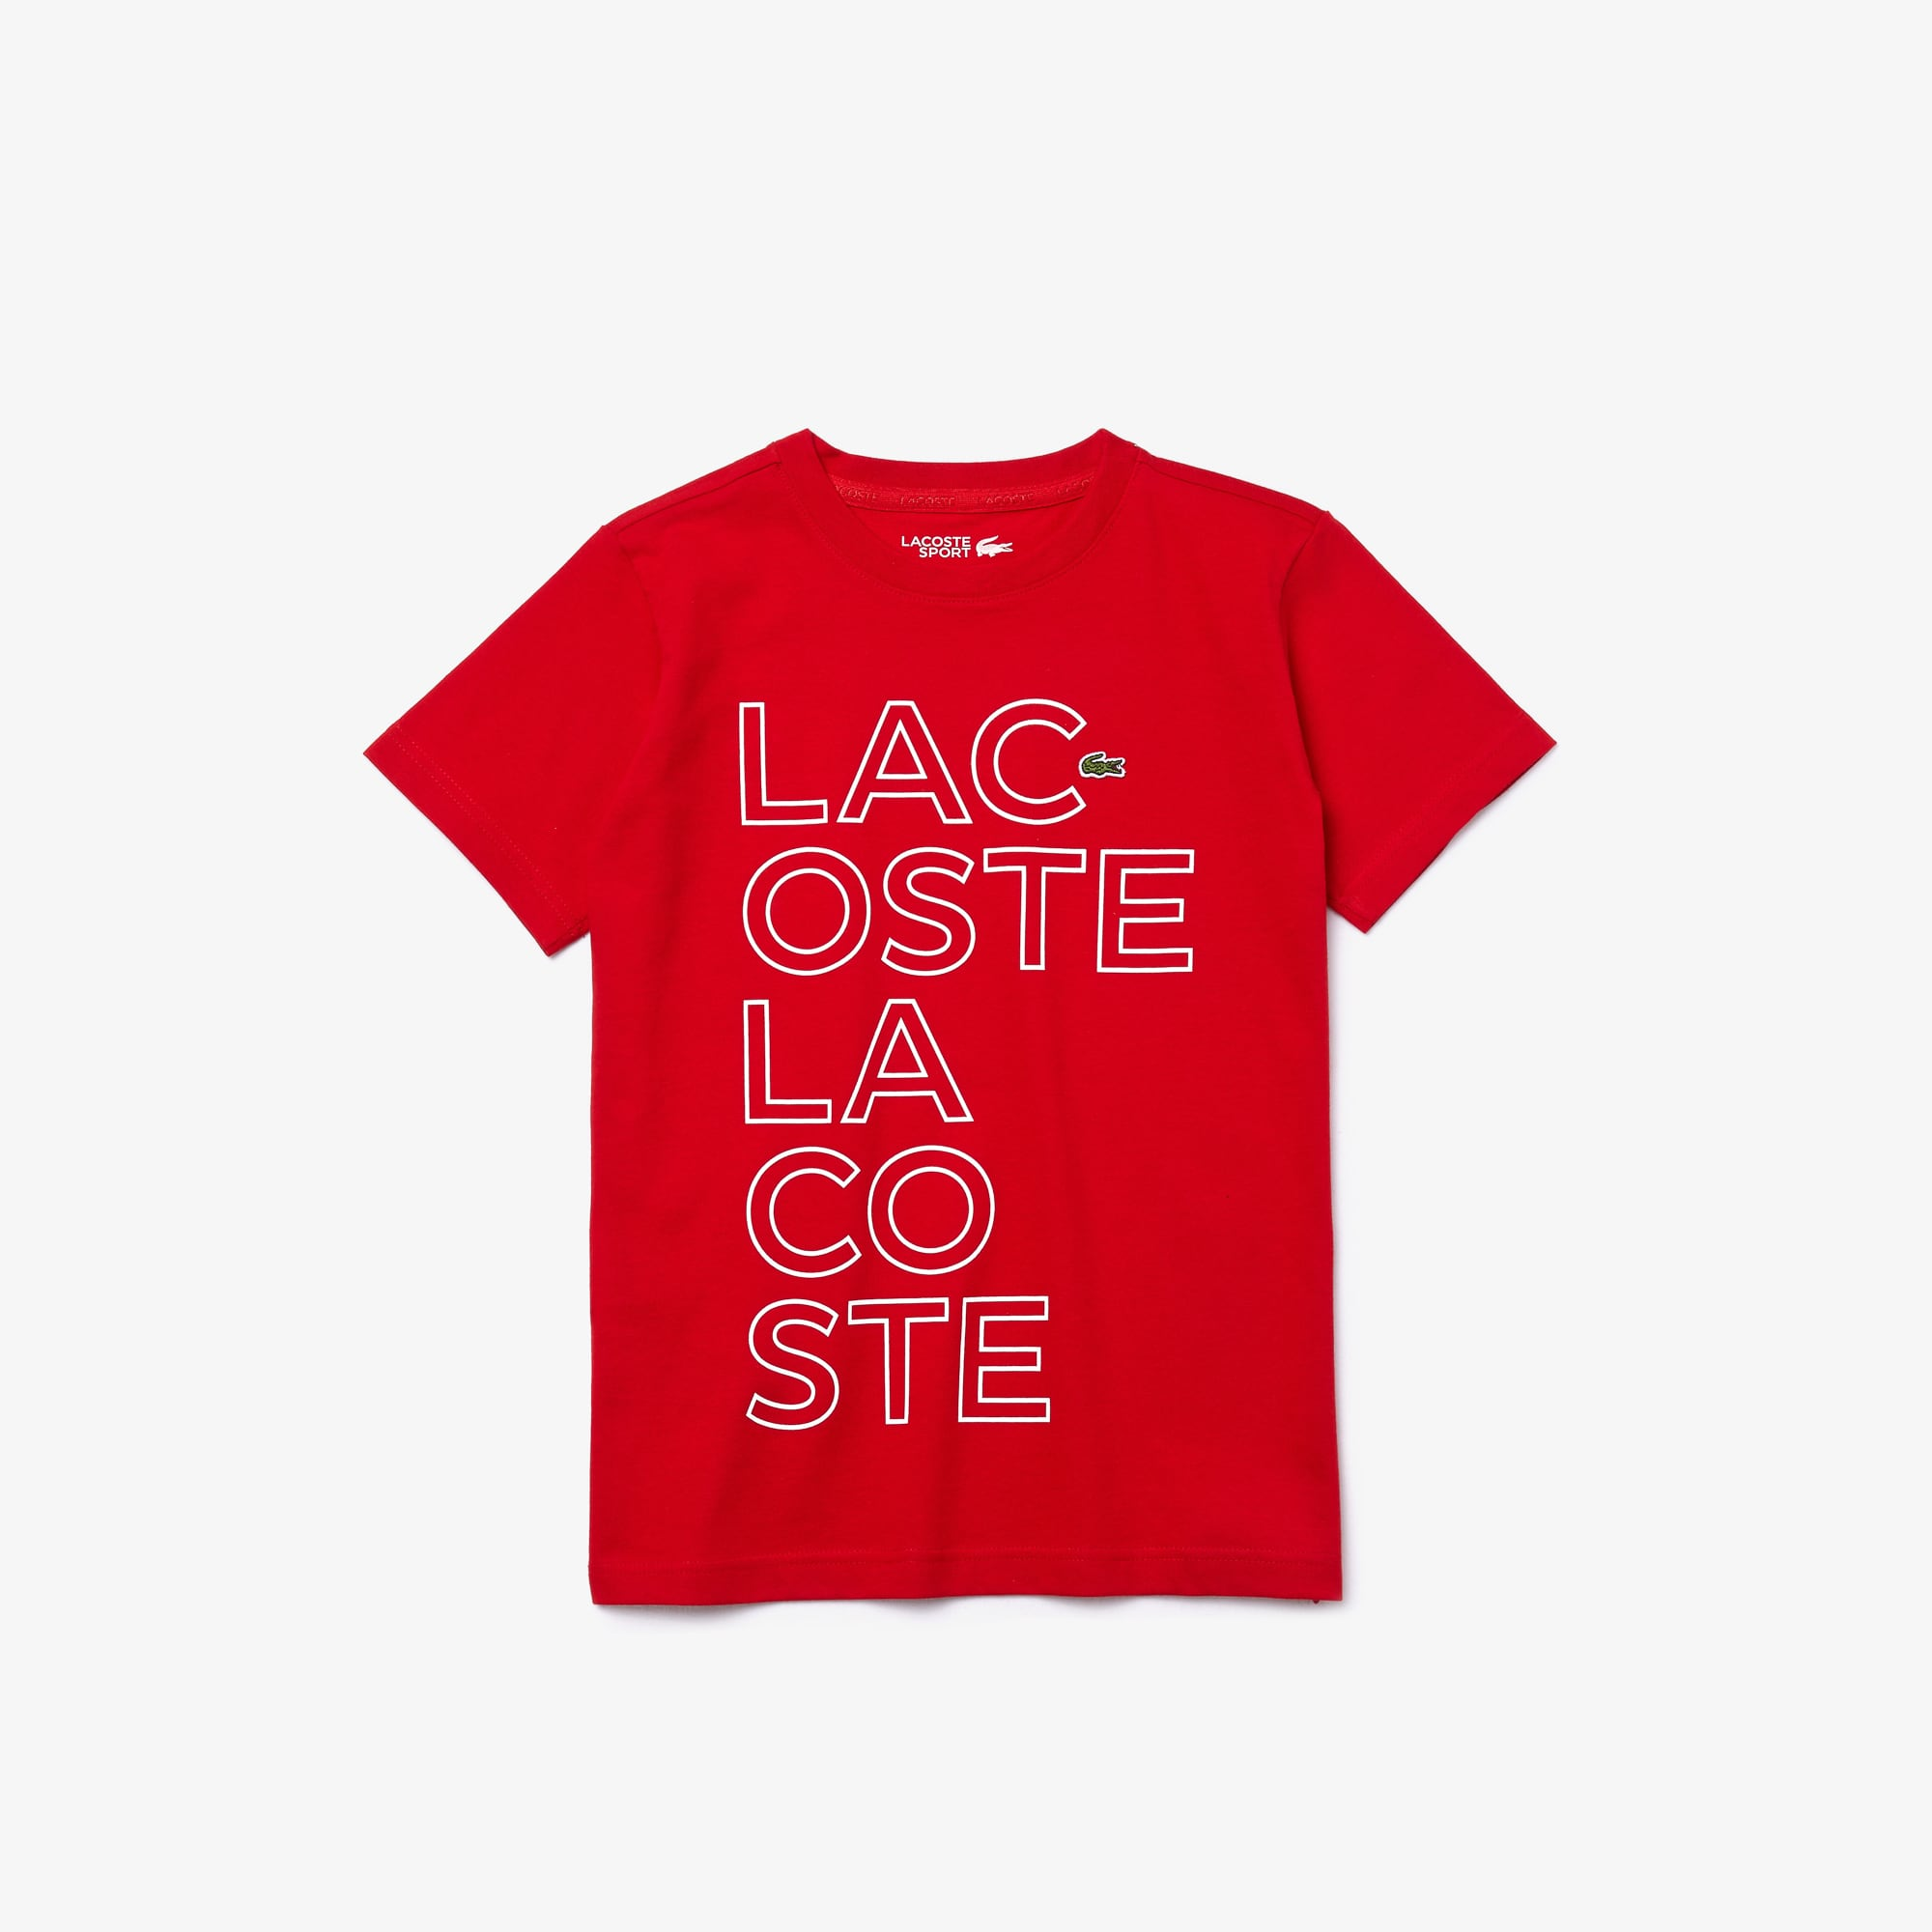 Boys 라코스테 Lacoste SPORT Printed Breathable Cotton T-shirt